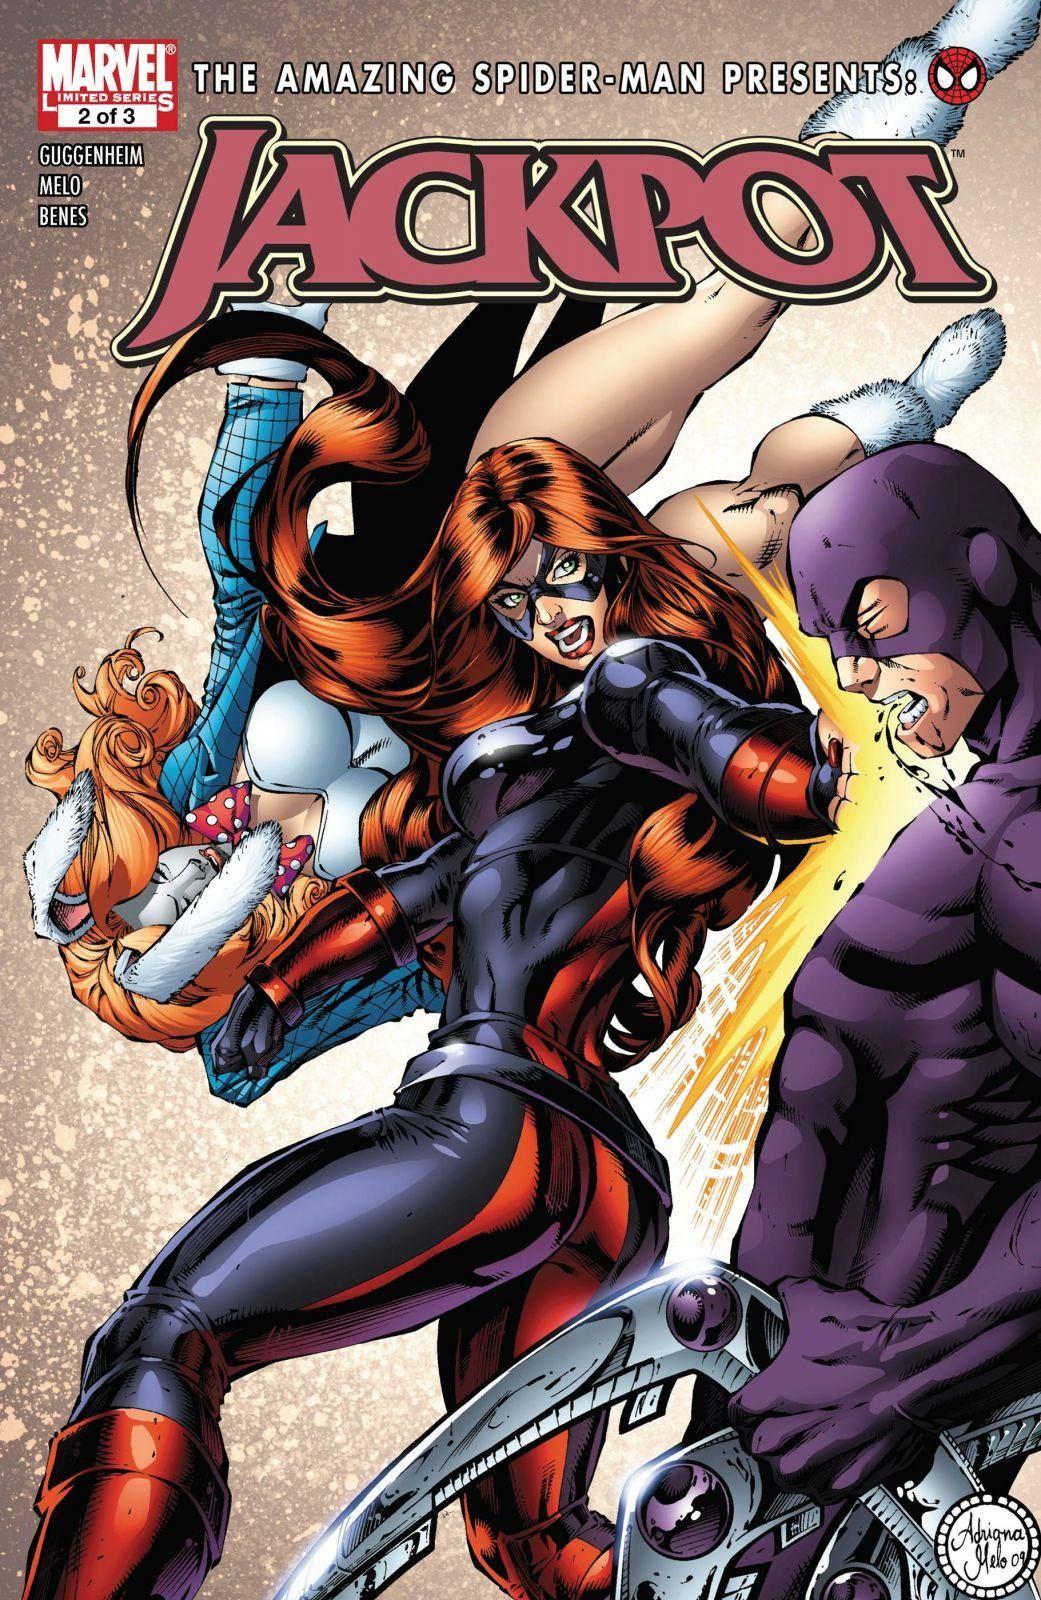 Marc Guggenheim escribirá el spin-off de Spider-Man: Jackpot 2